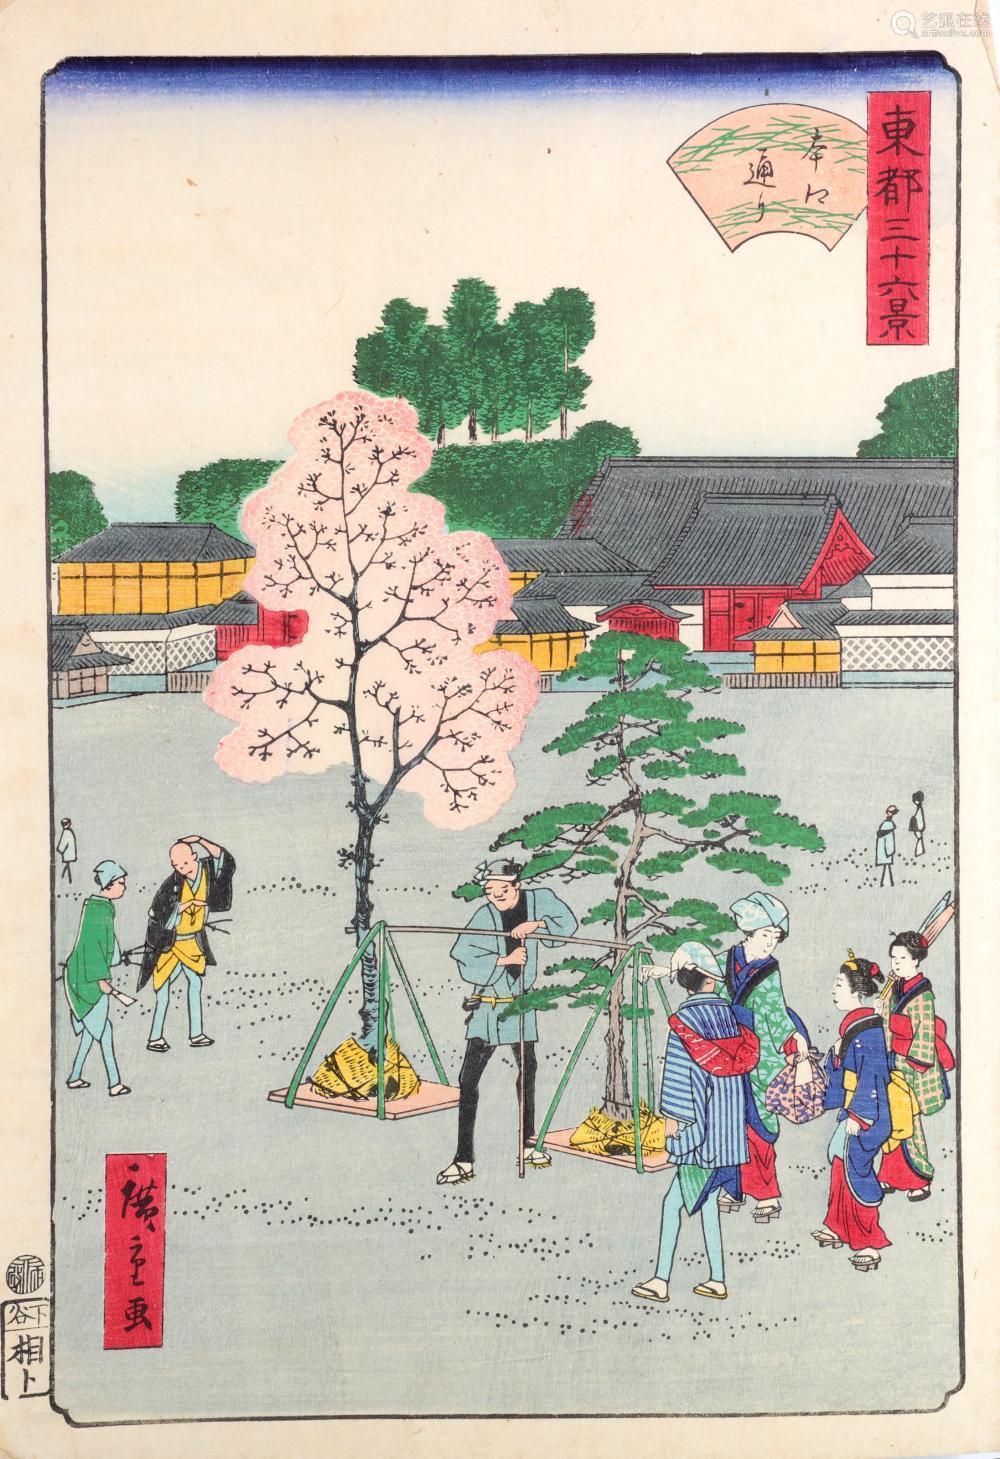 UTAGAWA HIROSHIGE II (1826 - 1869) Woodblock print